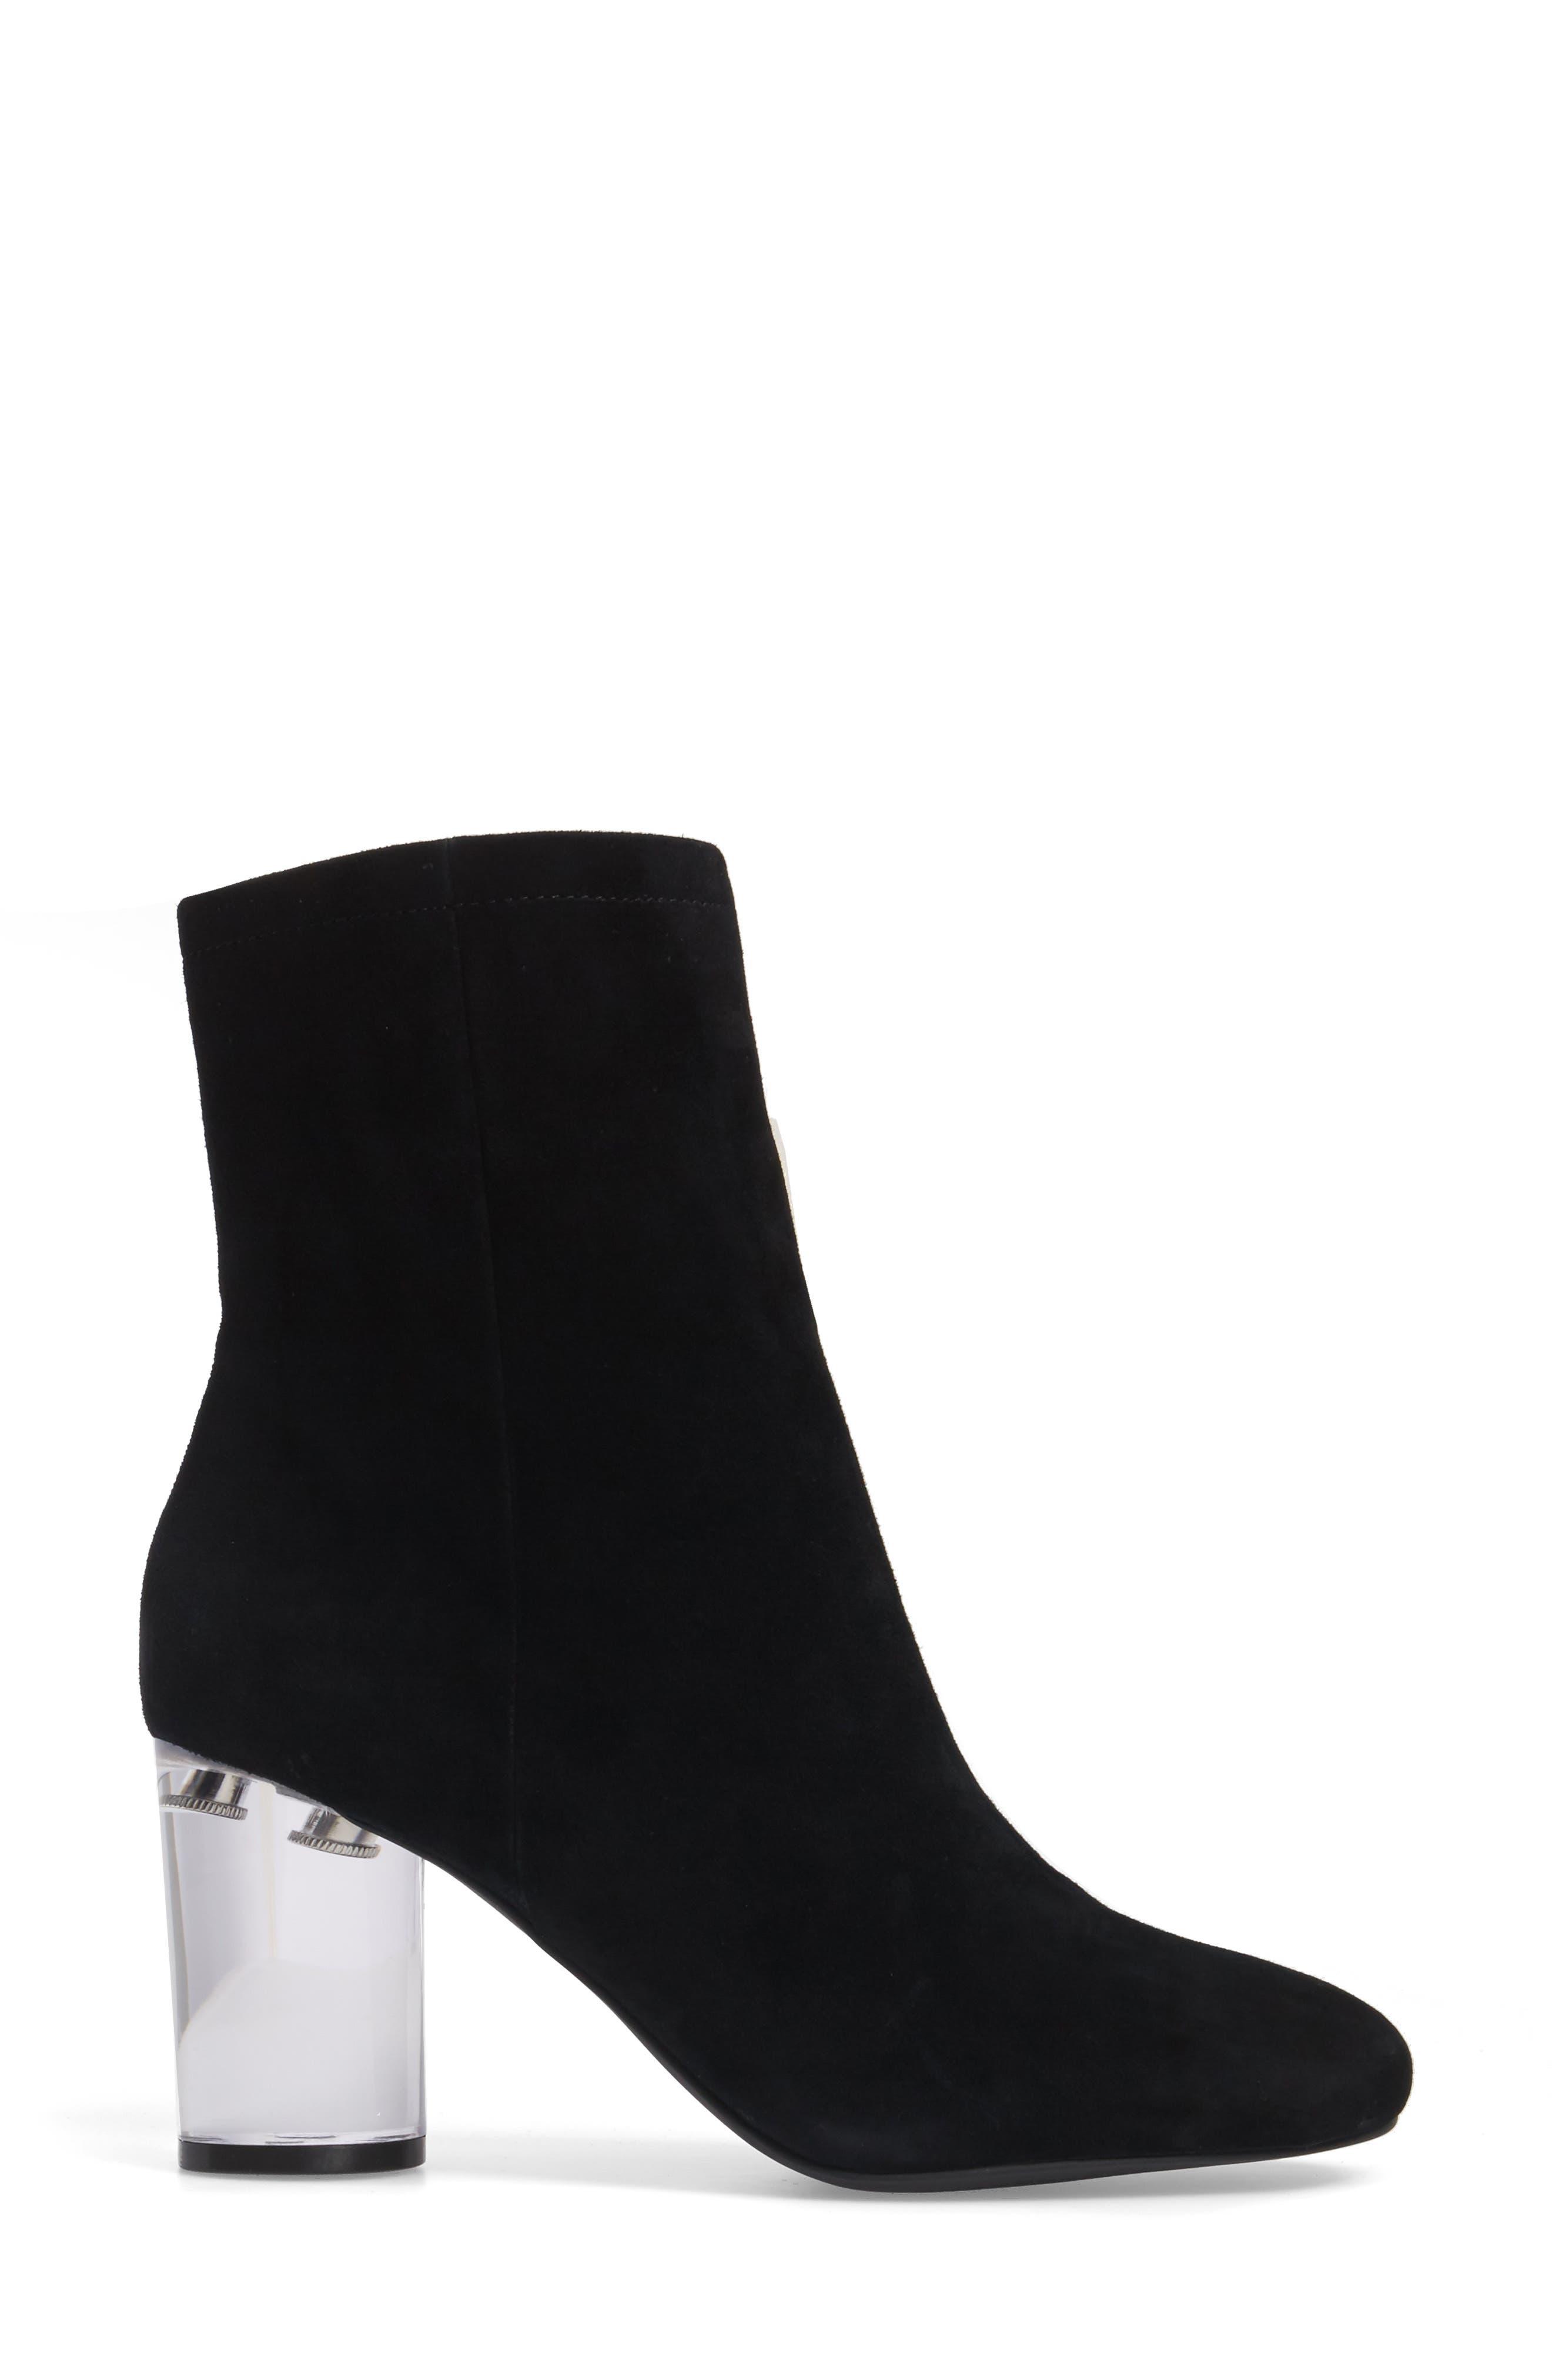 Alternate Image 3  - Jessica Simpson Merta Column Heel Bootie (Women)